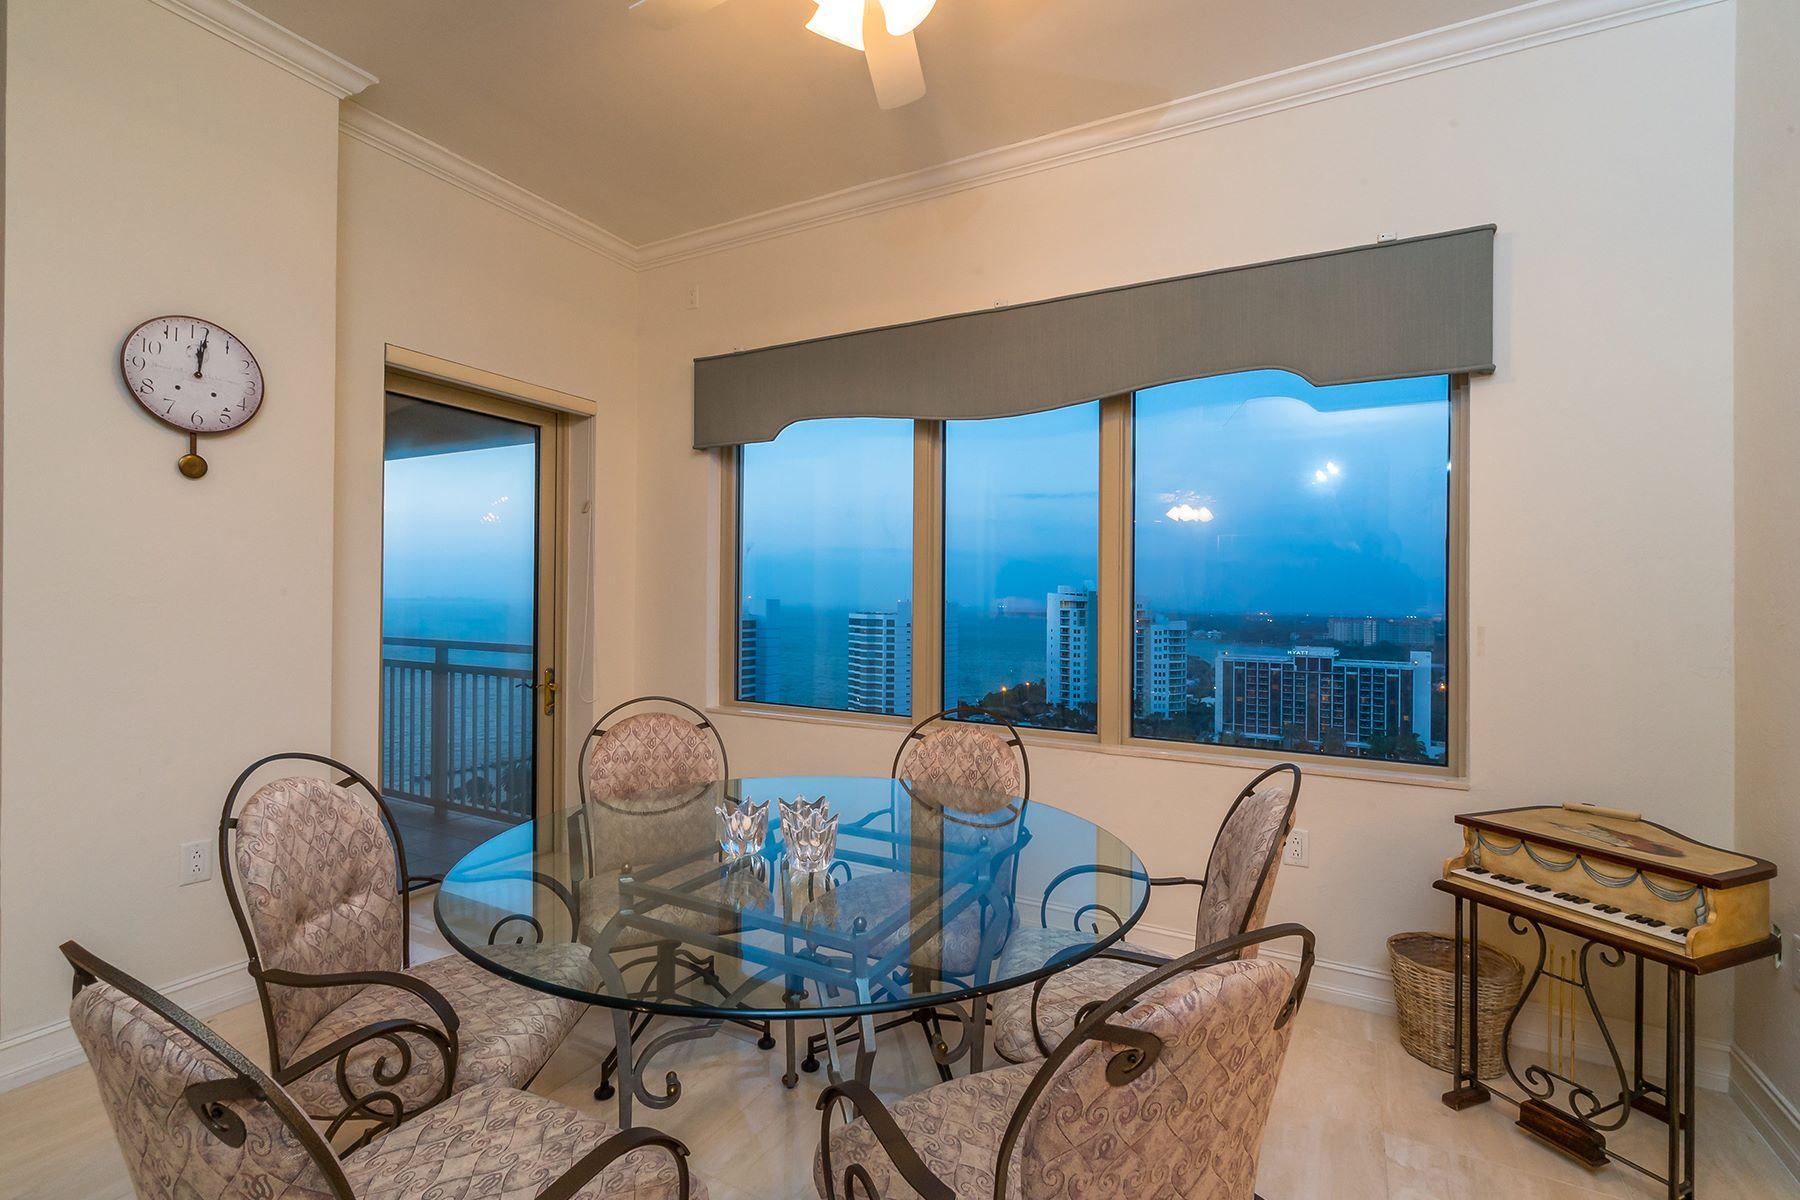 Additional photo for property listing at THE RESIDENCES AT RITZ CARLTON 1111  Ritz Carlton Dr 1803,  Sarasota, Florida 34236 United States